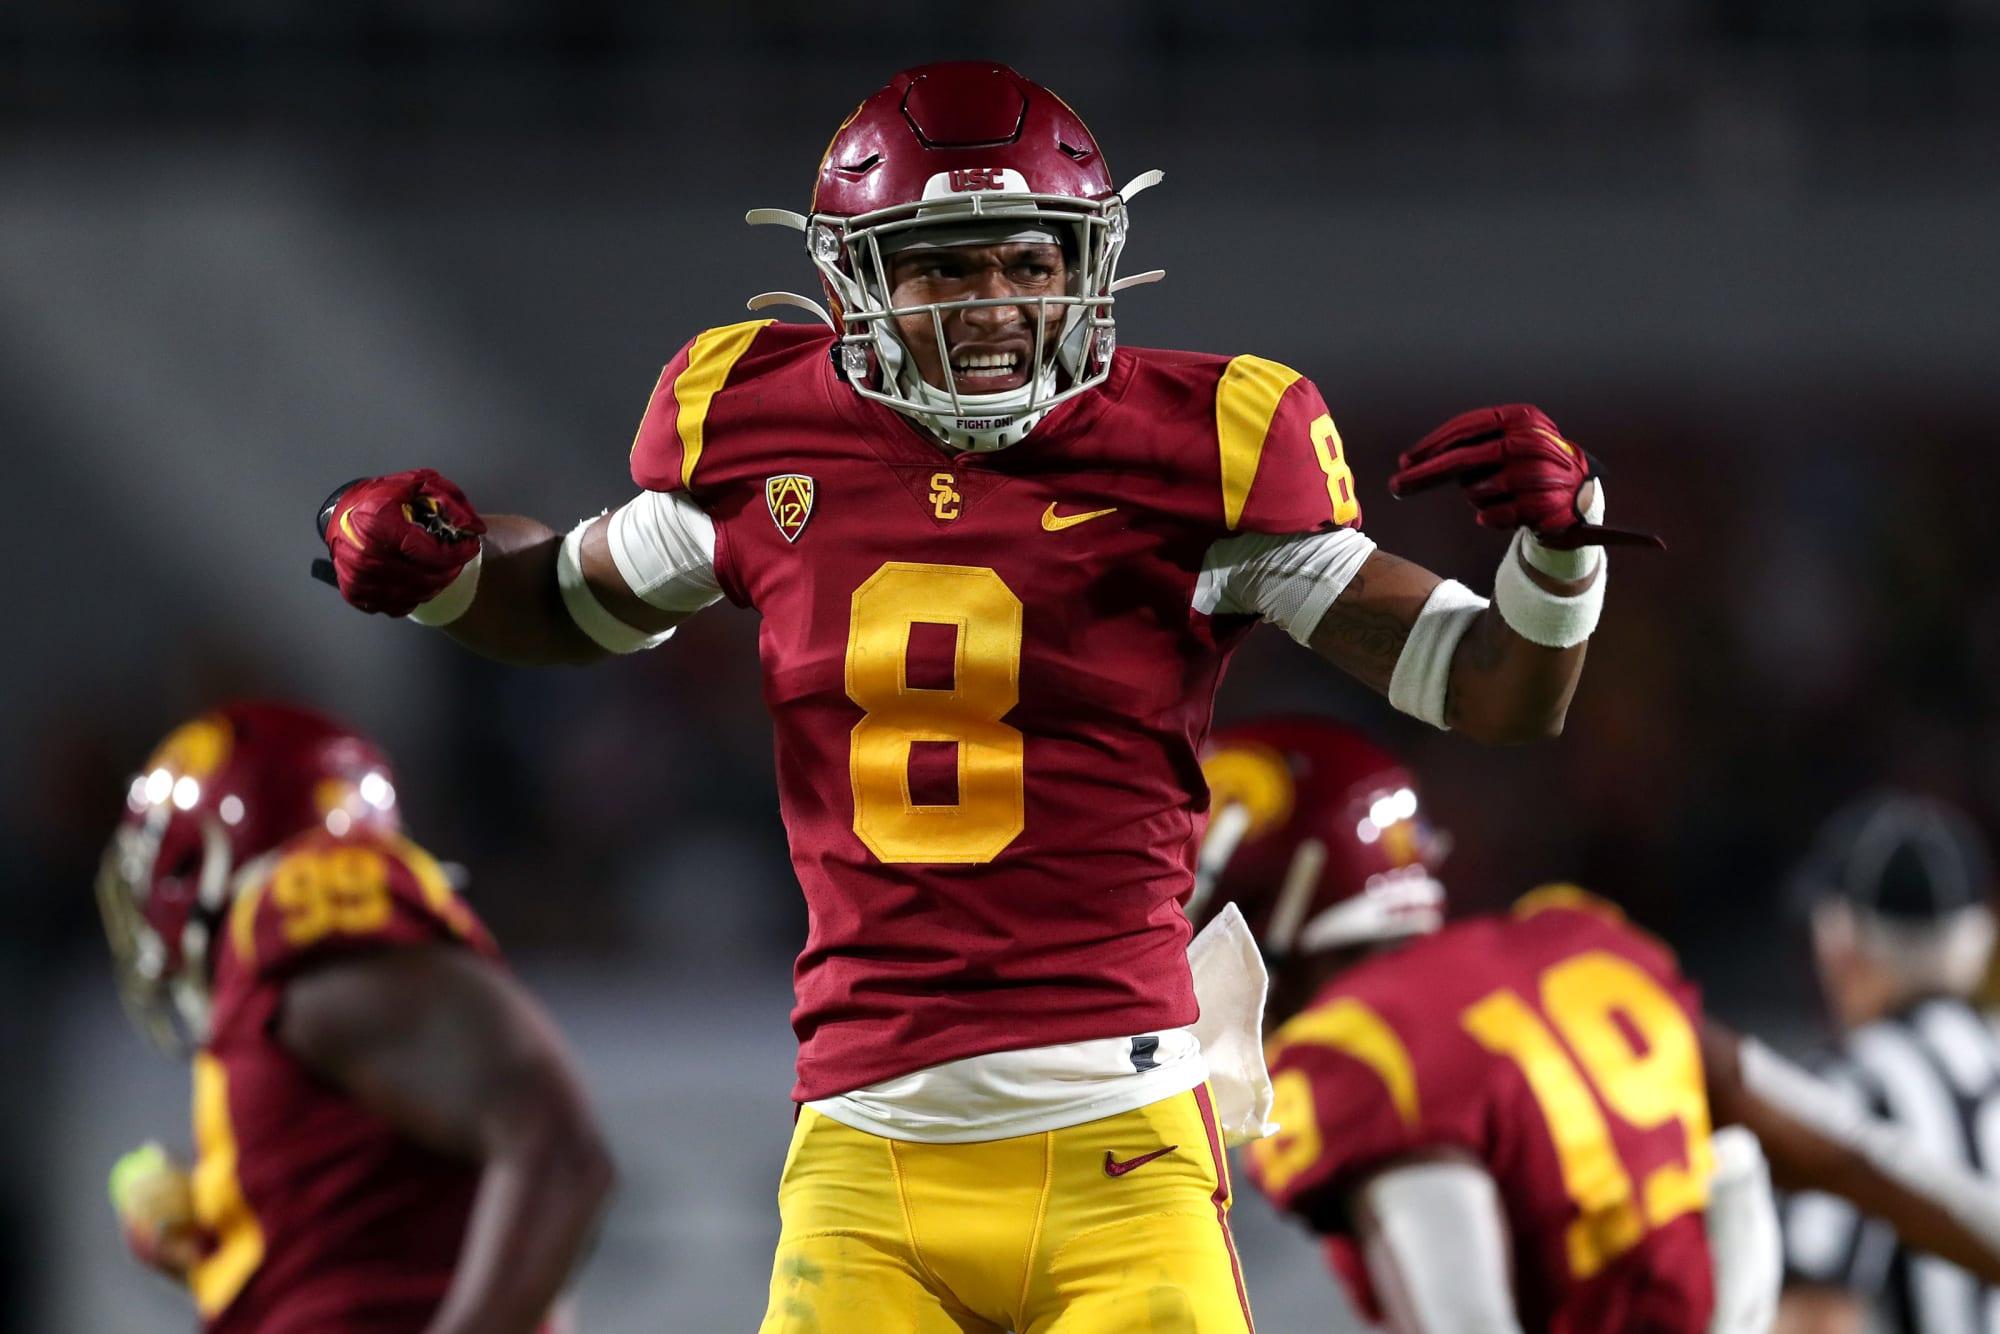 USC football players, fans celebrate new 2020 season on Twitter